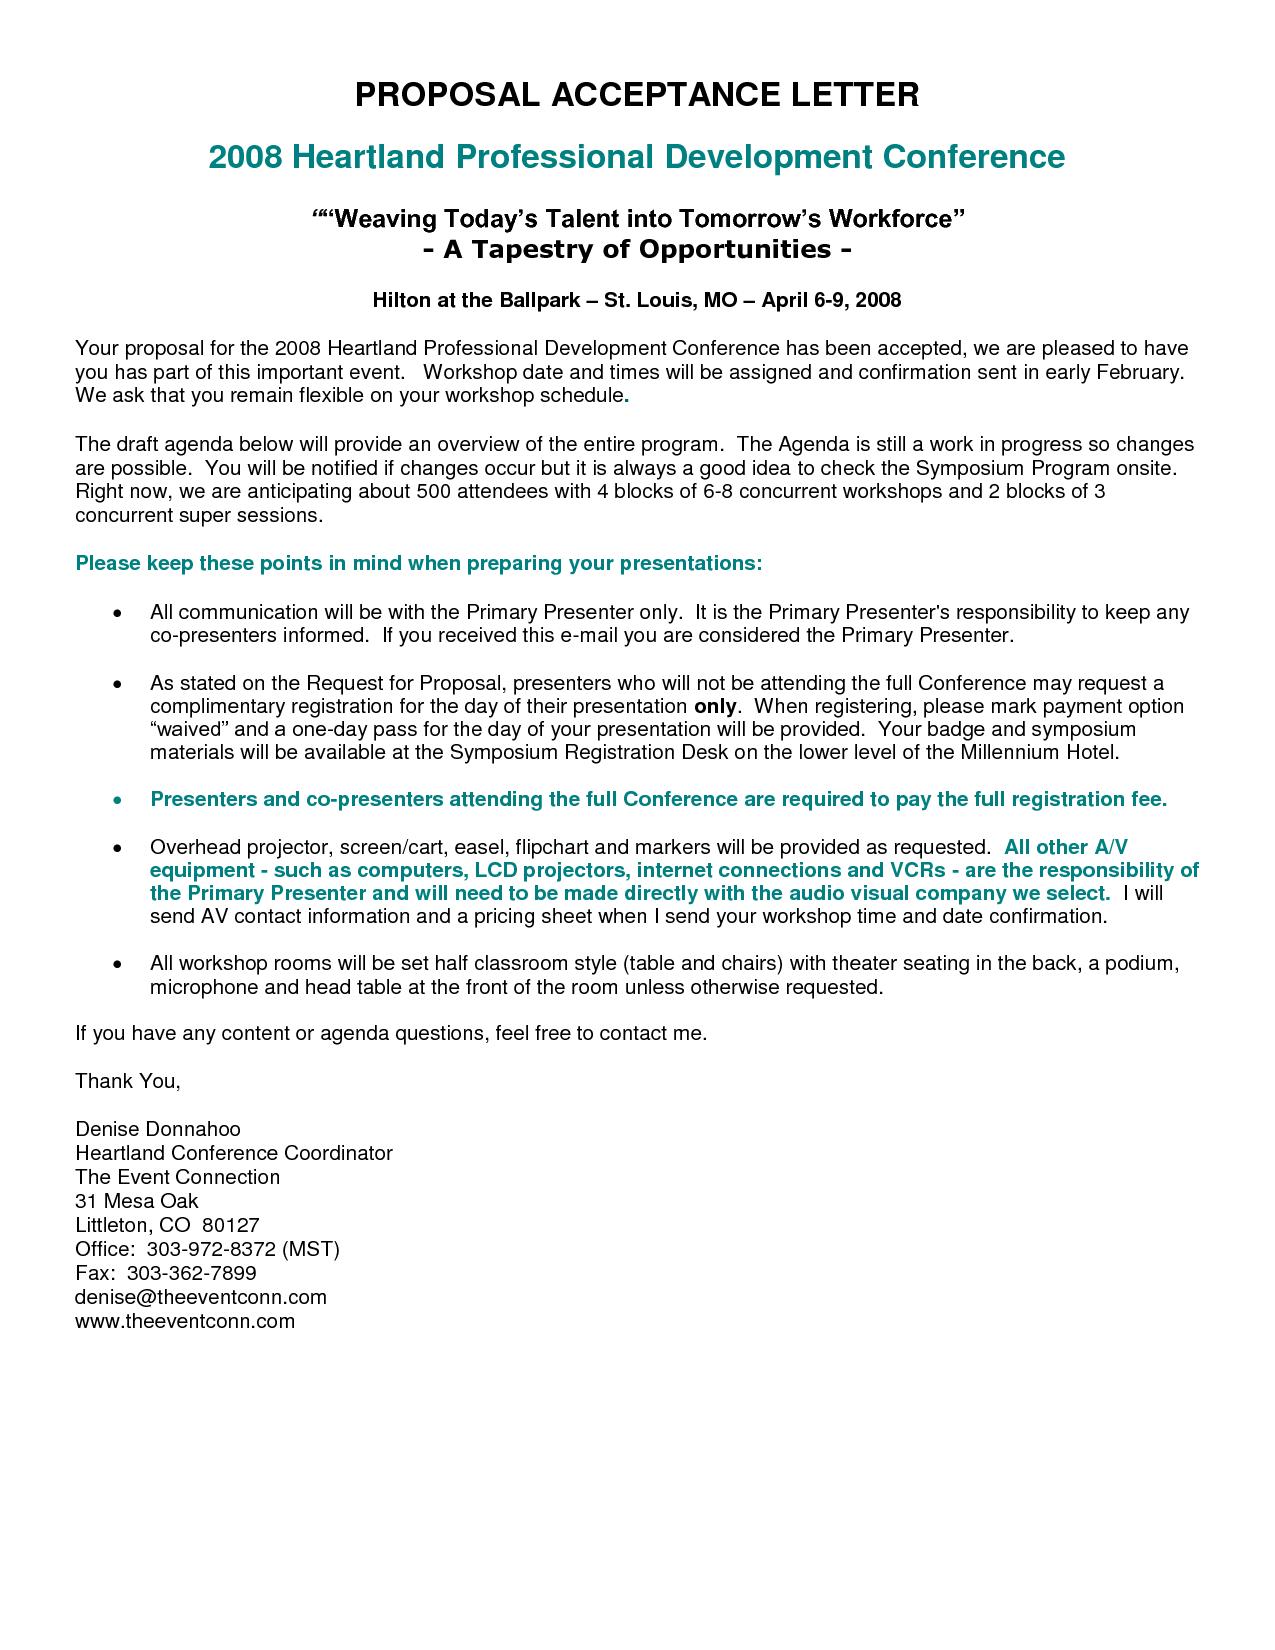 educational proposal letter proposal acceptance letter educational proposal letter proposal acceptance letter